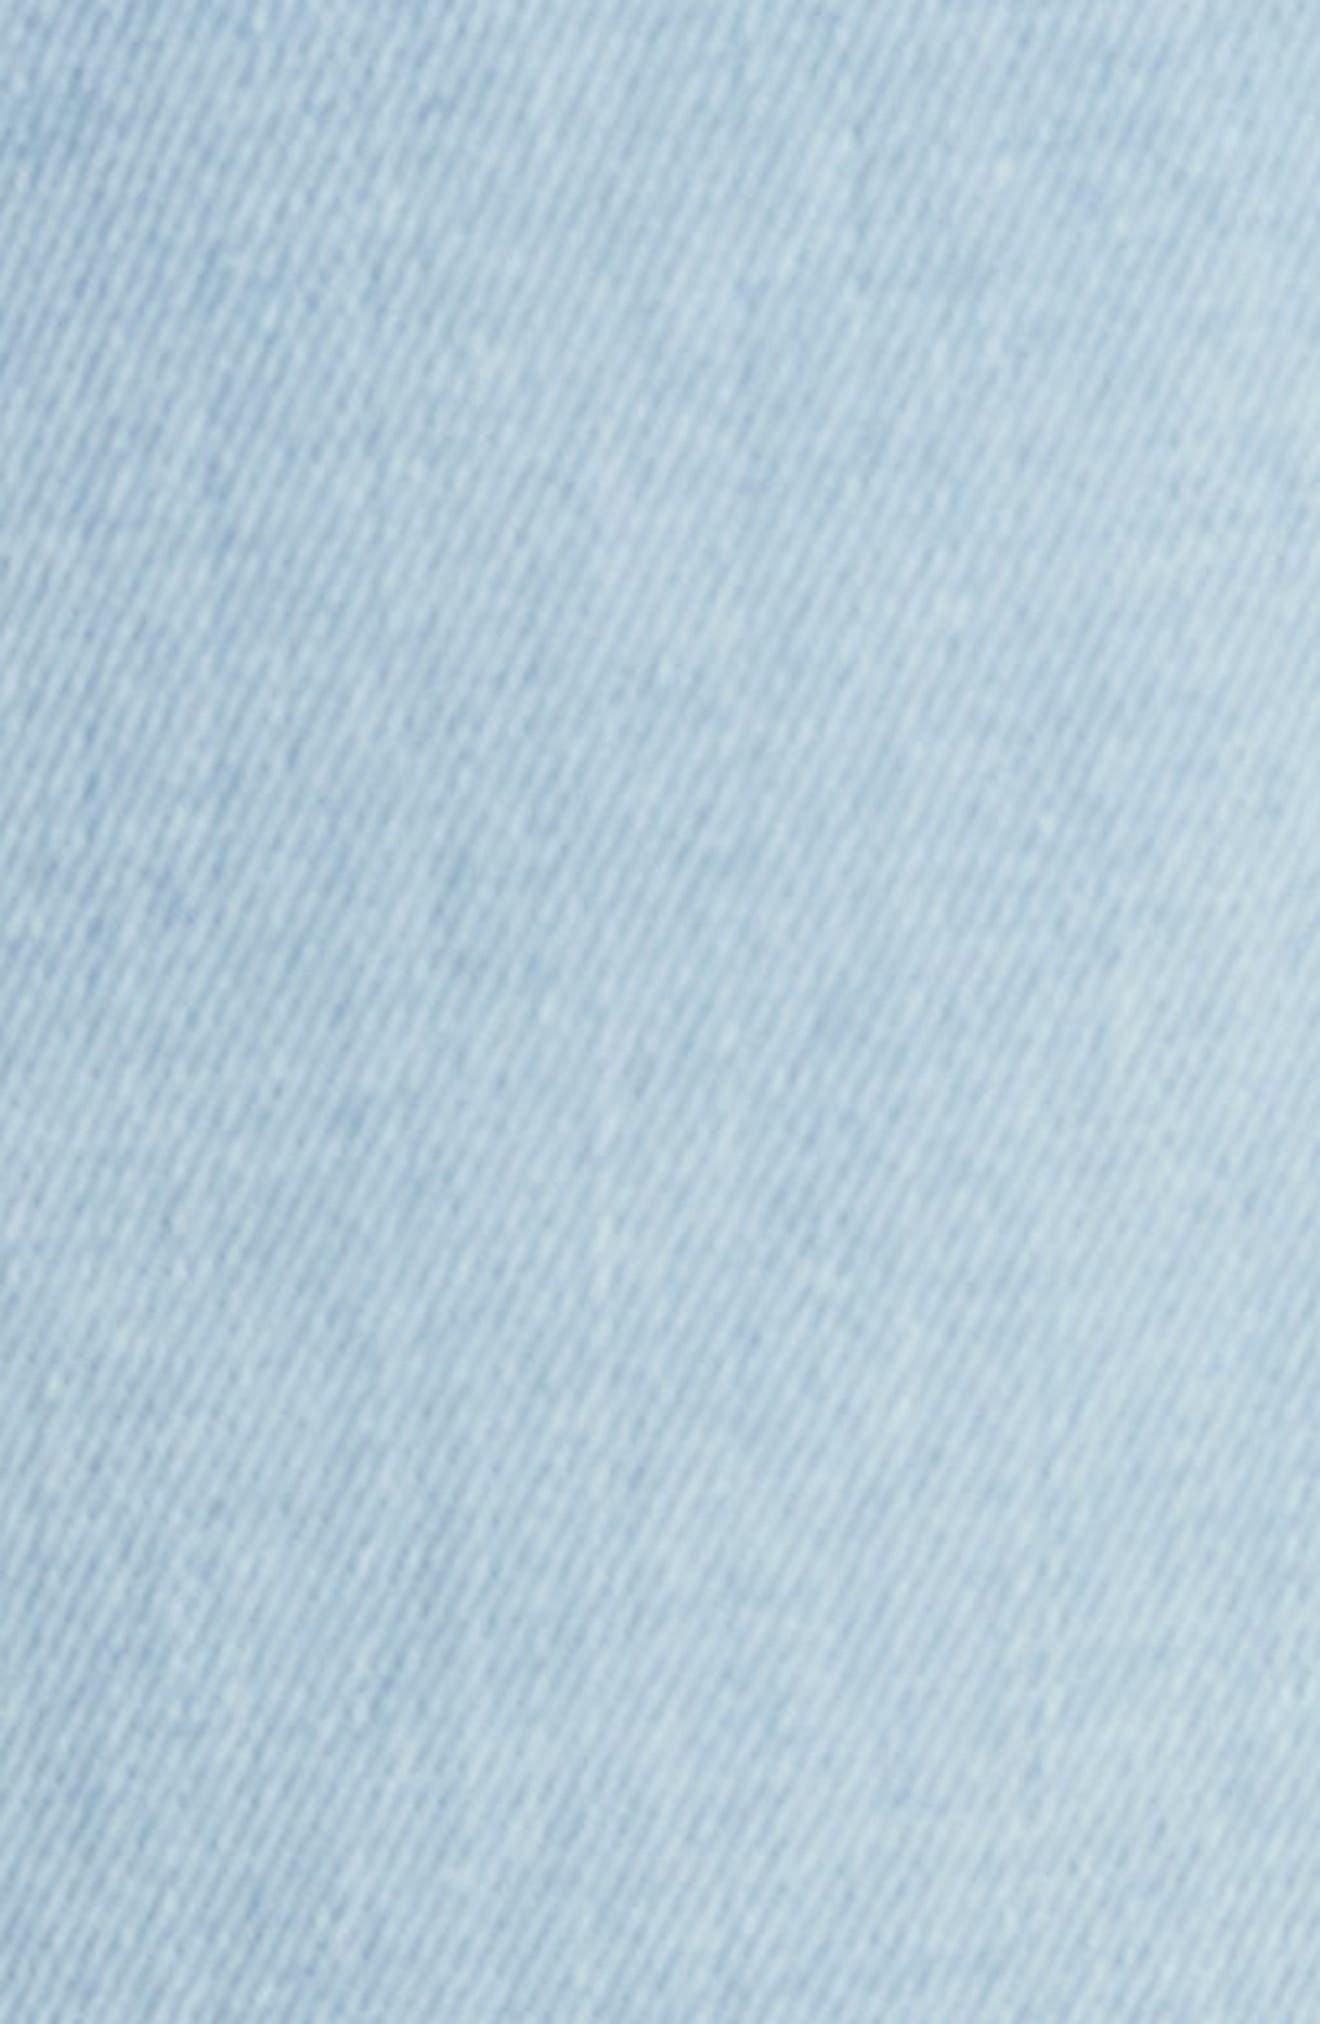 Mara Skinny Jeans,                             Alternate thumbnail 5, color,                             400